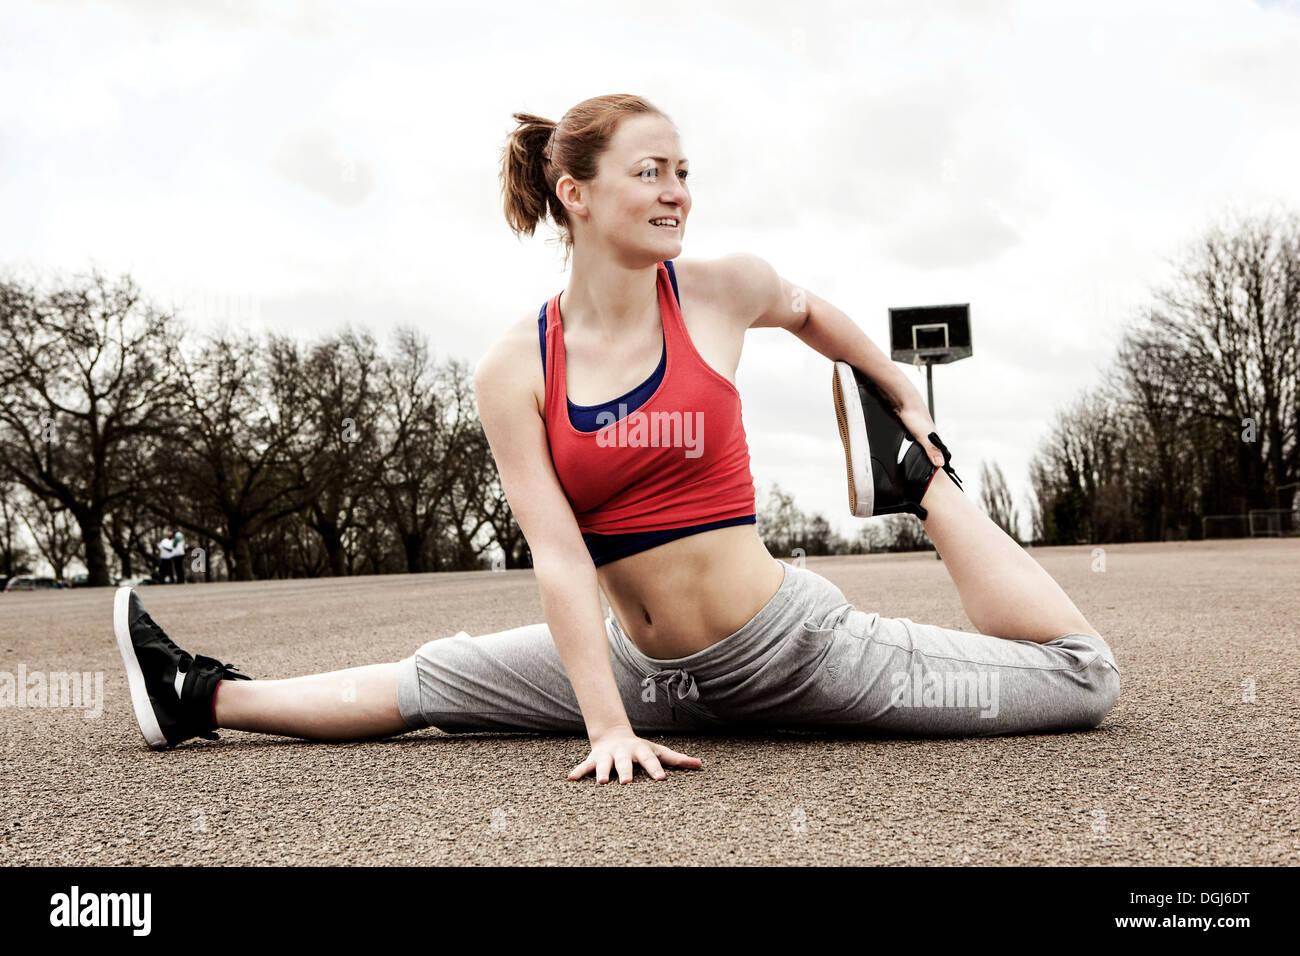 Woman doing splits with left leg bent backwards - Stock Image